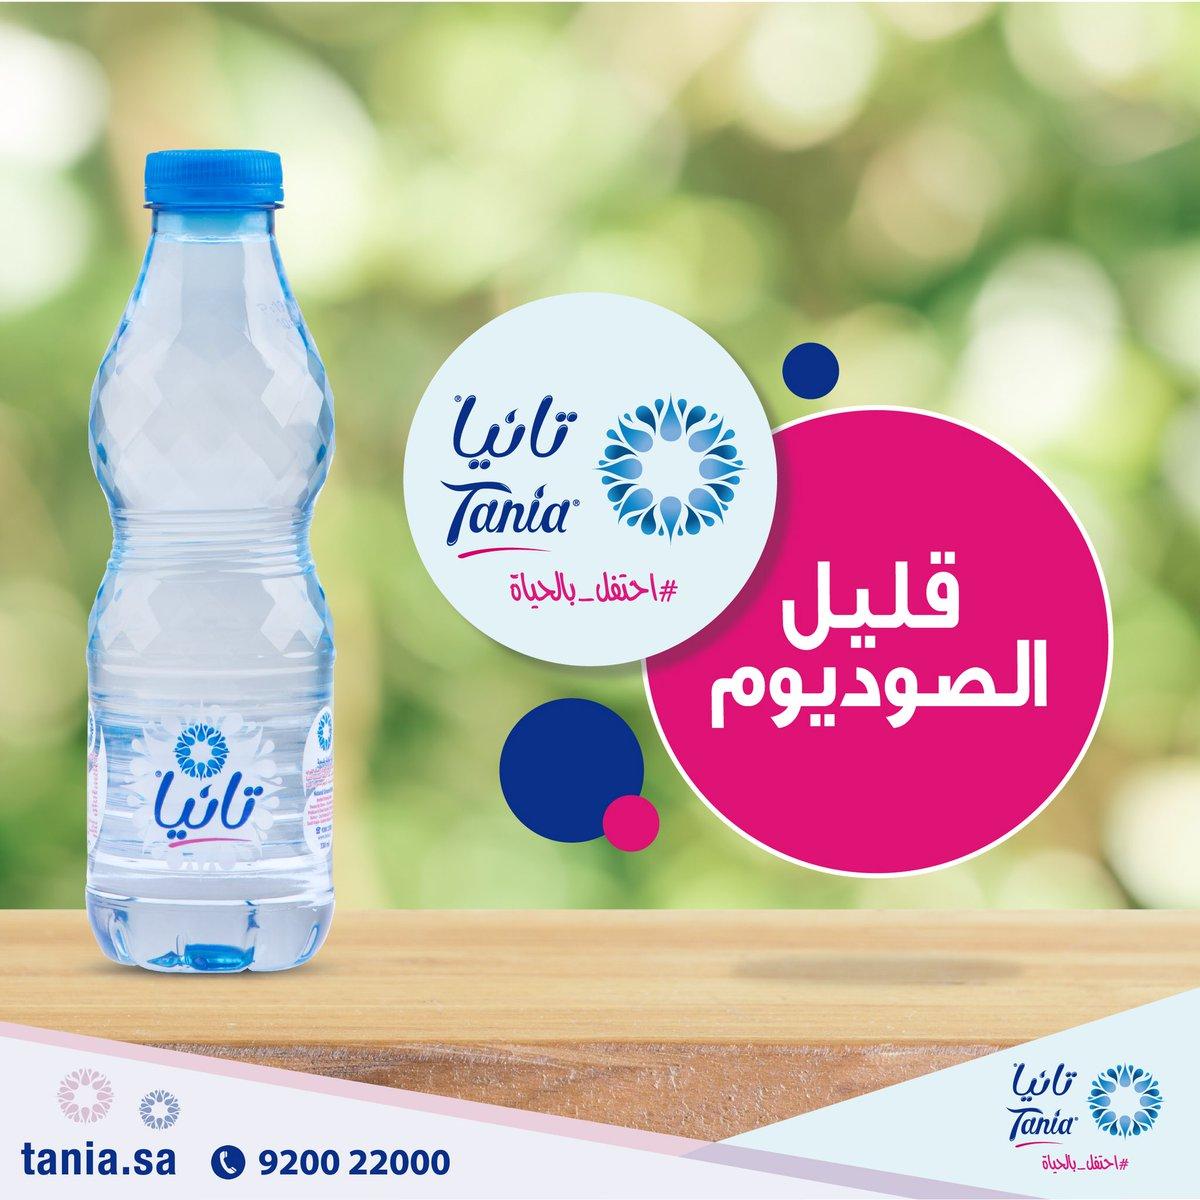 ميـاه تـانـيا A Twitter لأننا نهتم بصحتكم نقدم لكم مياه تانيا وبأقل نسبة صوديوم للطلب Https T Co 4qstgasce6